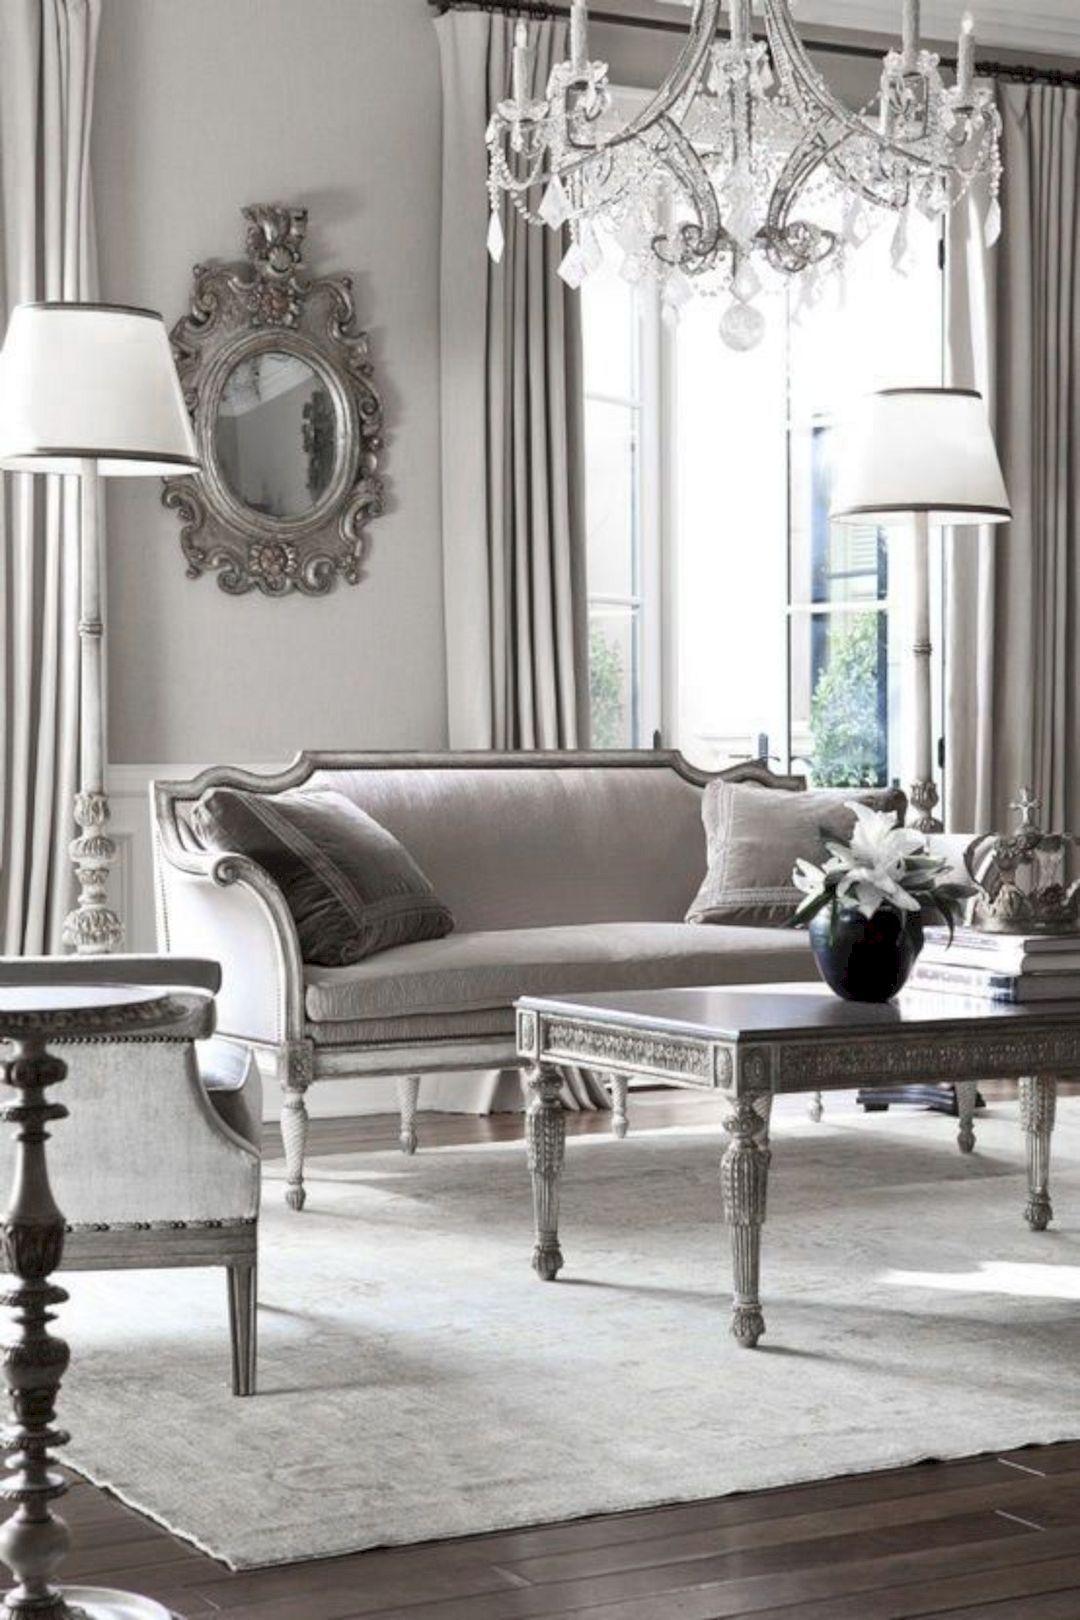 Attirant 15 Interior Design Ideas For Classic Living Room  Https://www.futuristarchitecture.com/31381 Classic Living Room.html